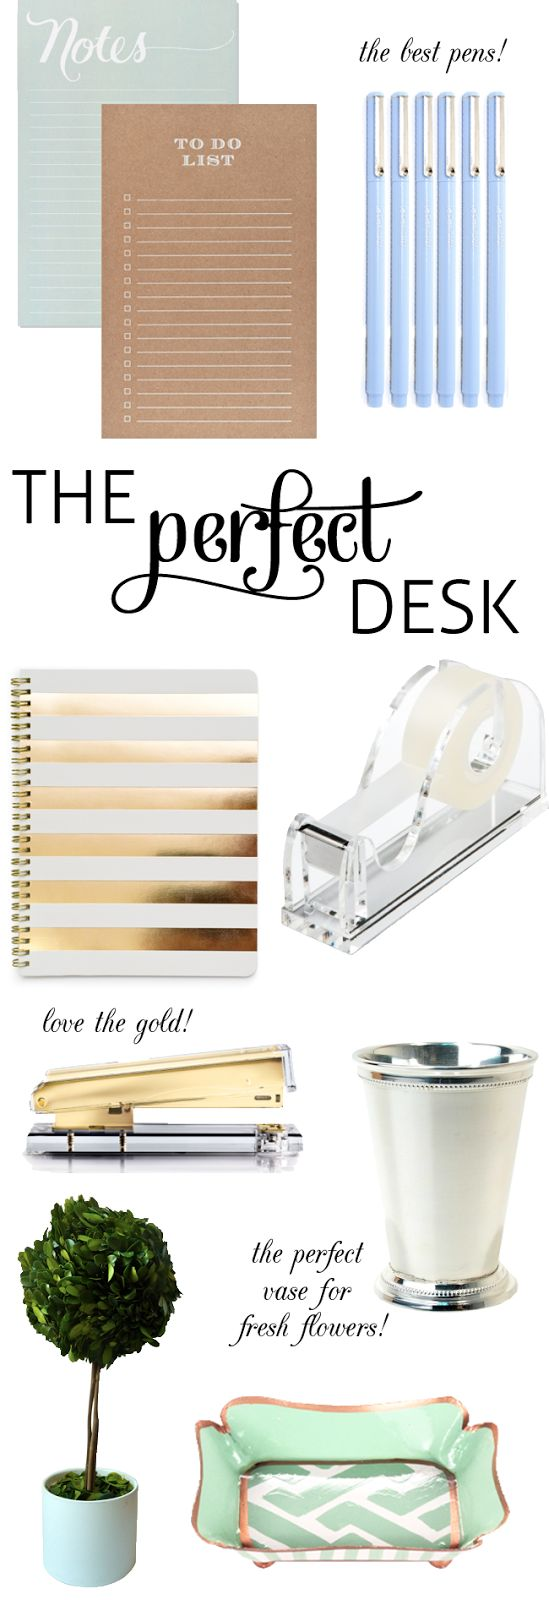 best workaholic images on pinterest home office desks and